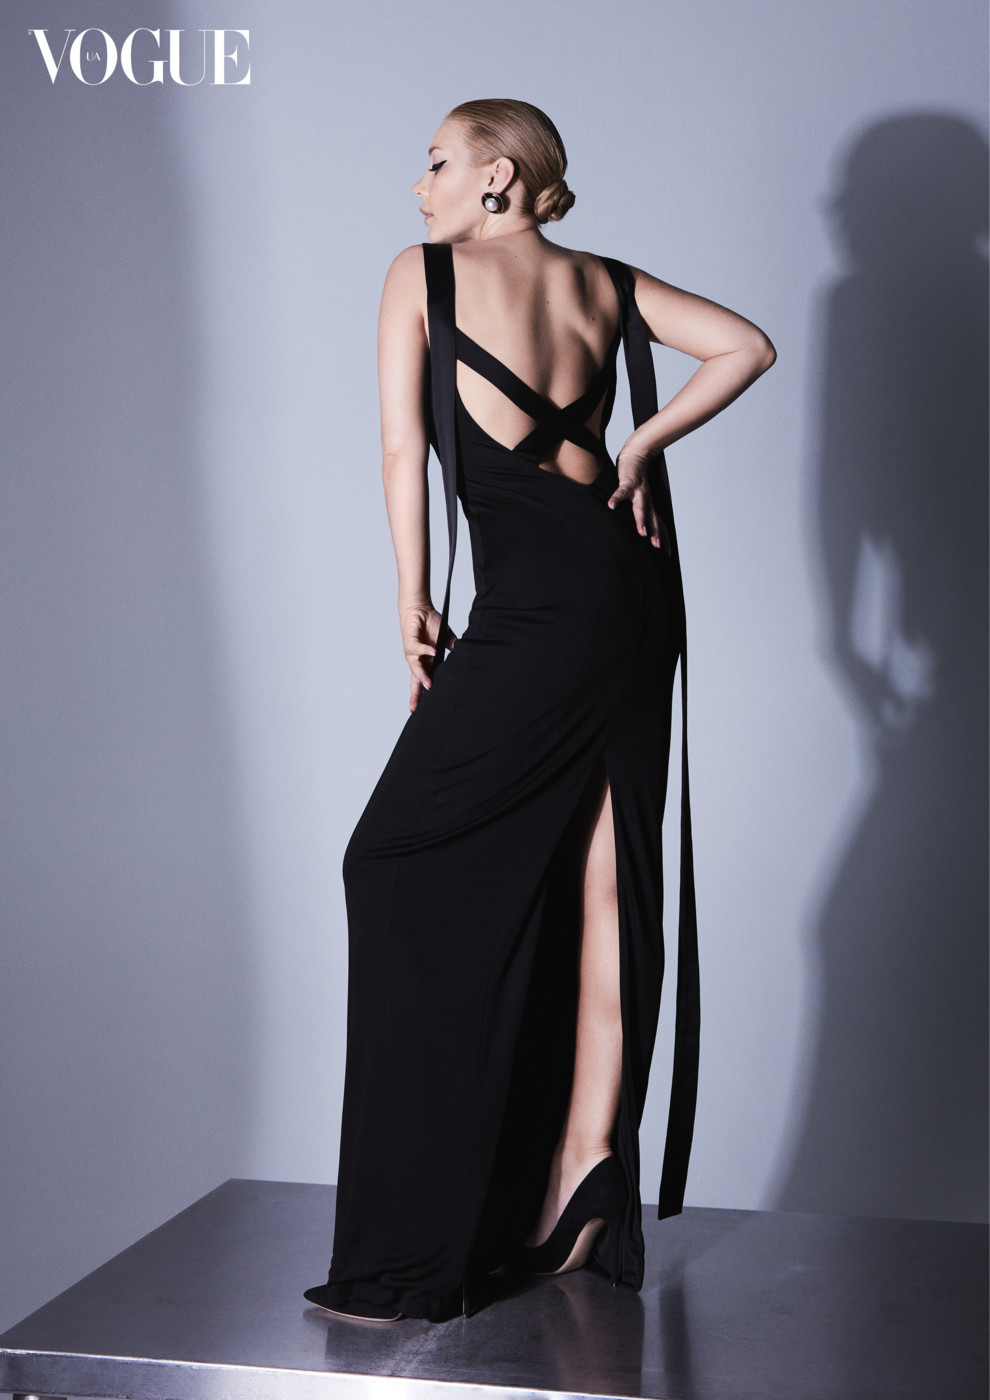 Тина Кароль Vogue 2020